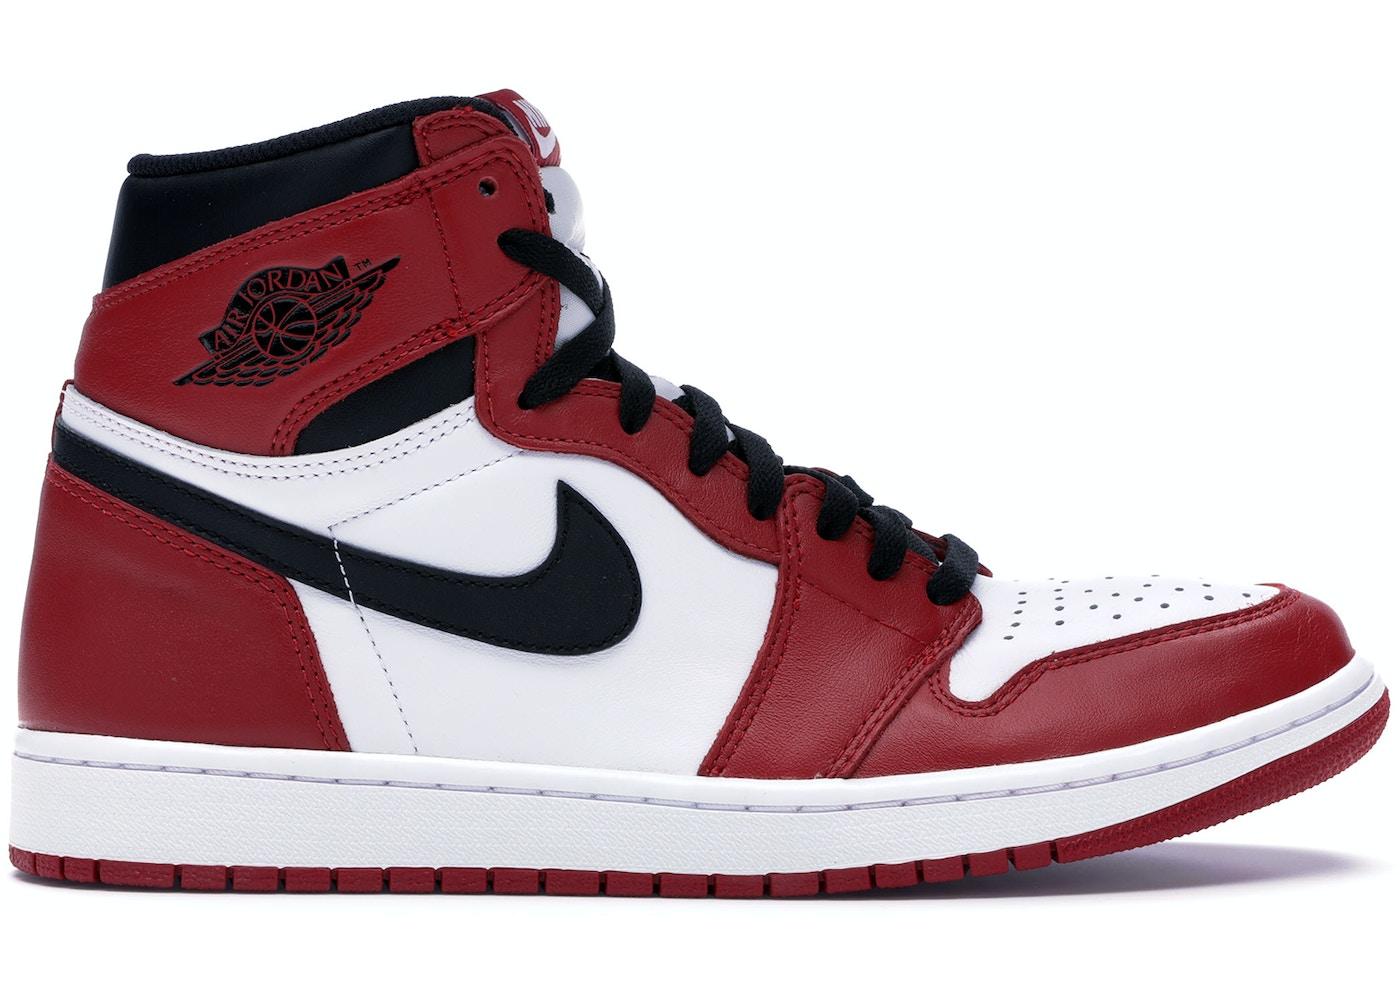 3f6282ca922b Jordan 1 Retro Chicago (2015) - 555088-101